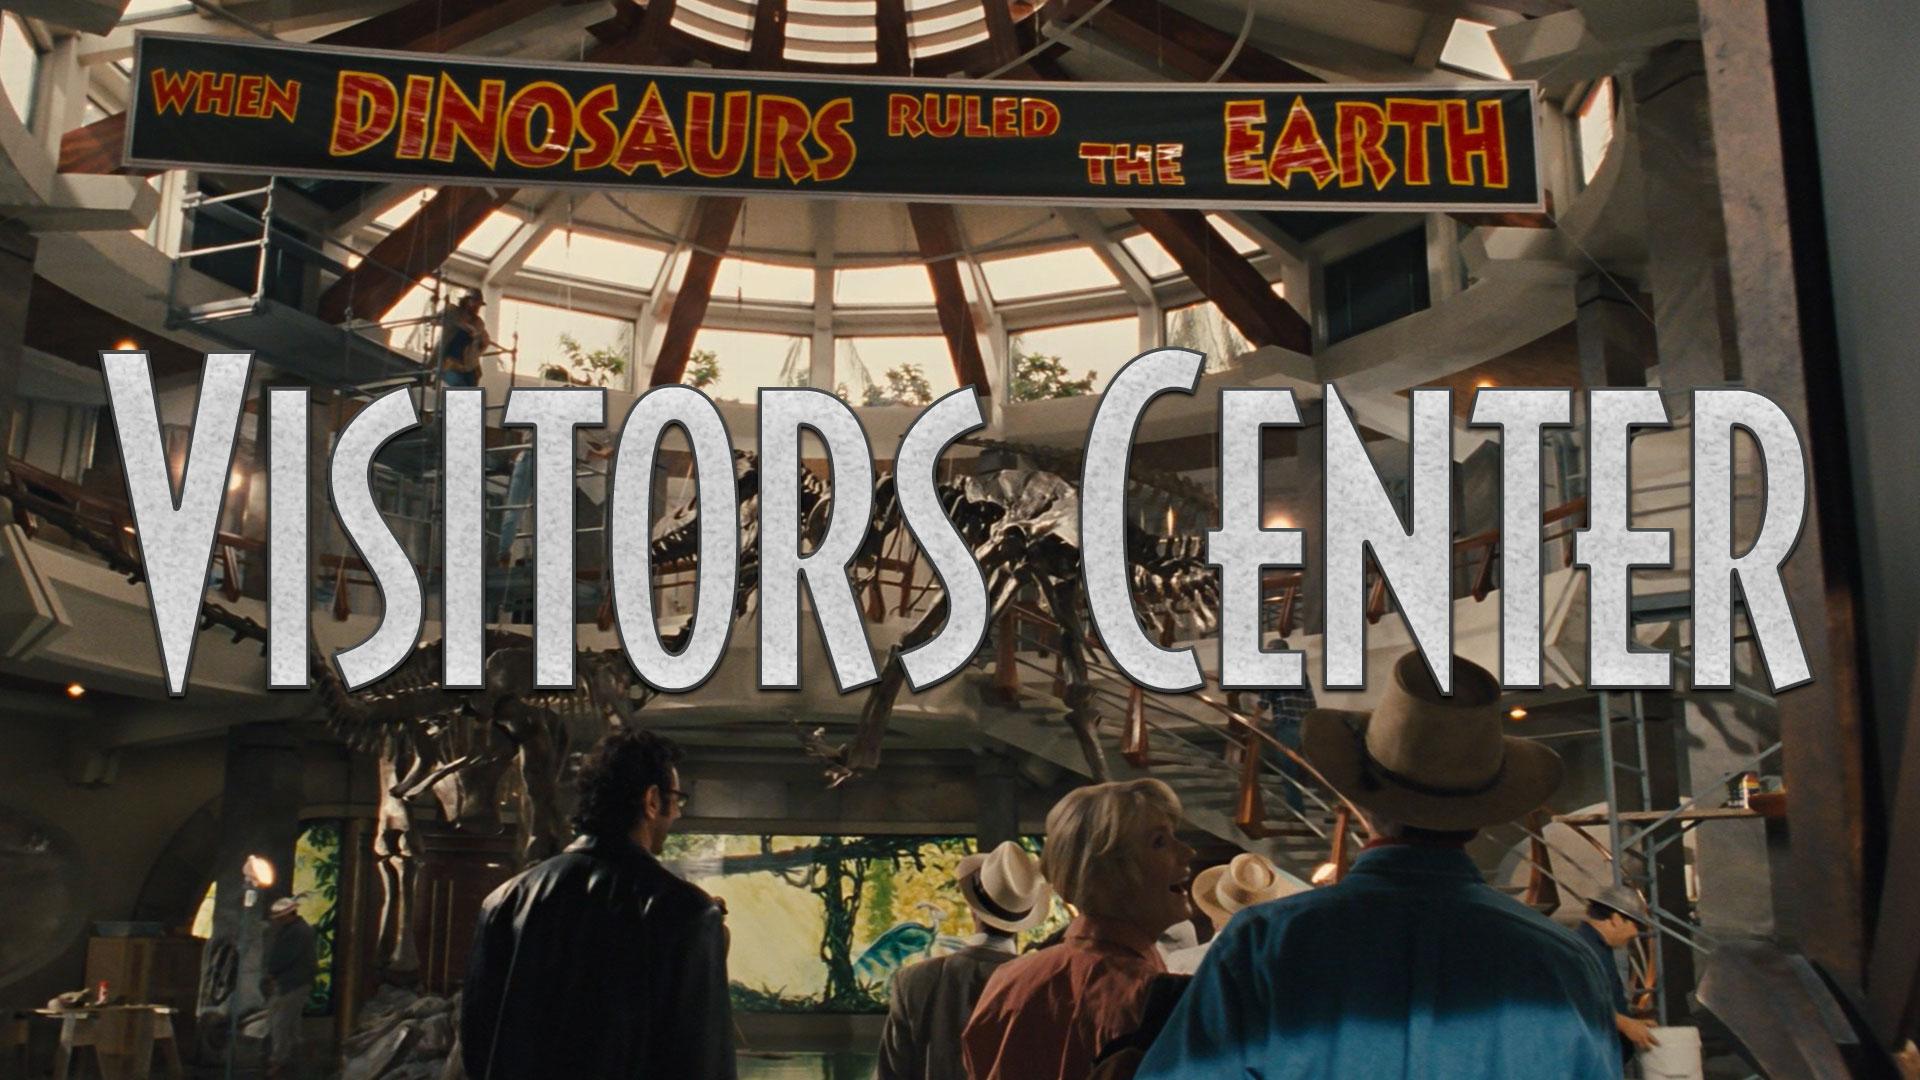 Visitors-Center.jpg